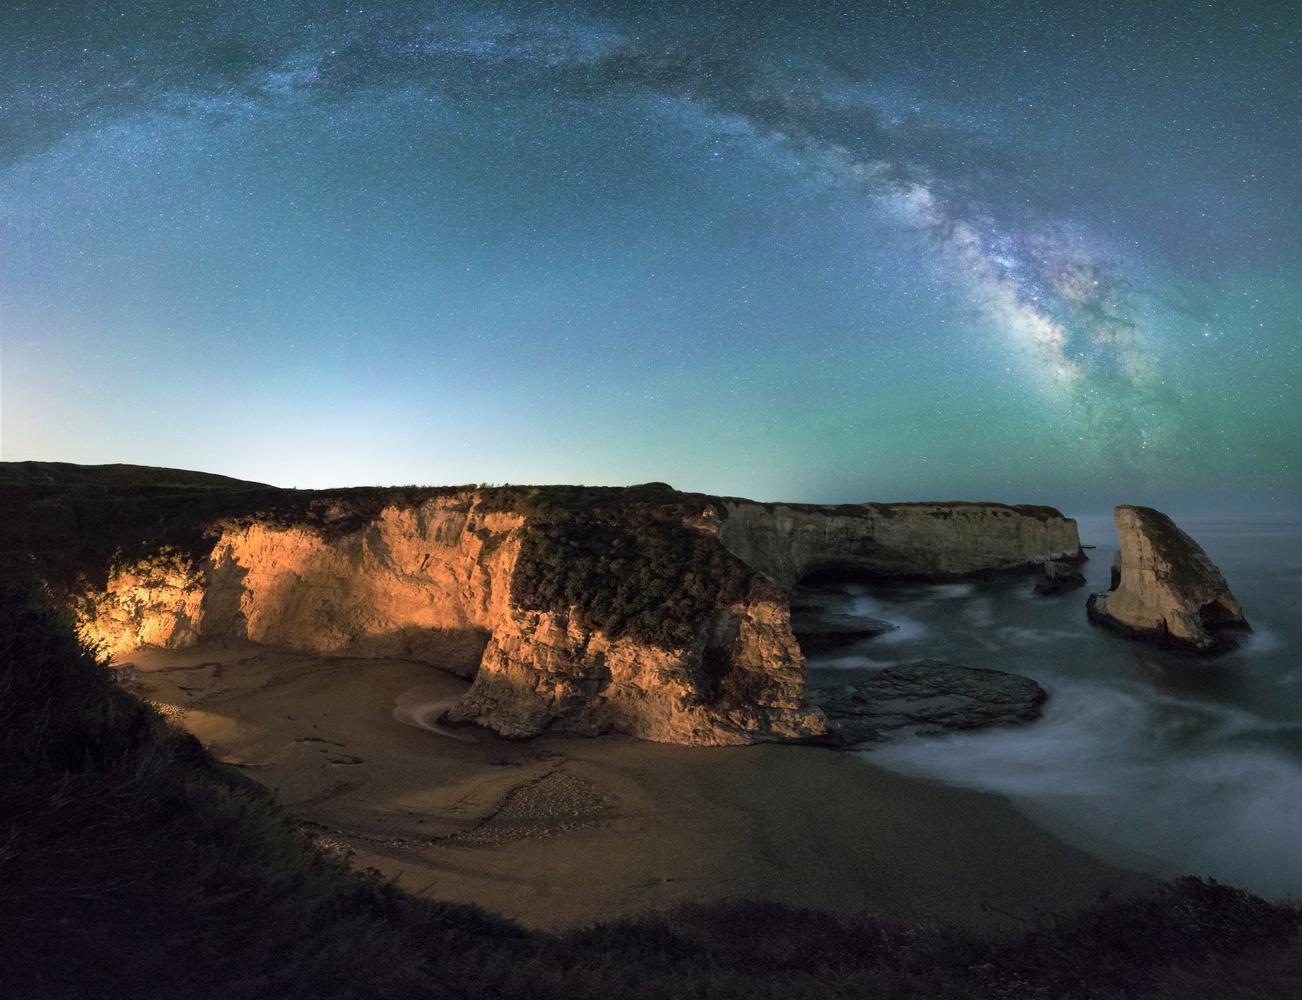 Shark Fin Cove Bonfire by Bryan Rossi